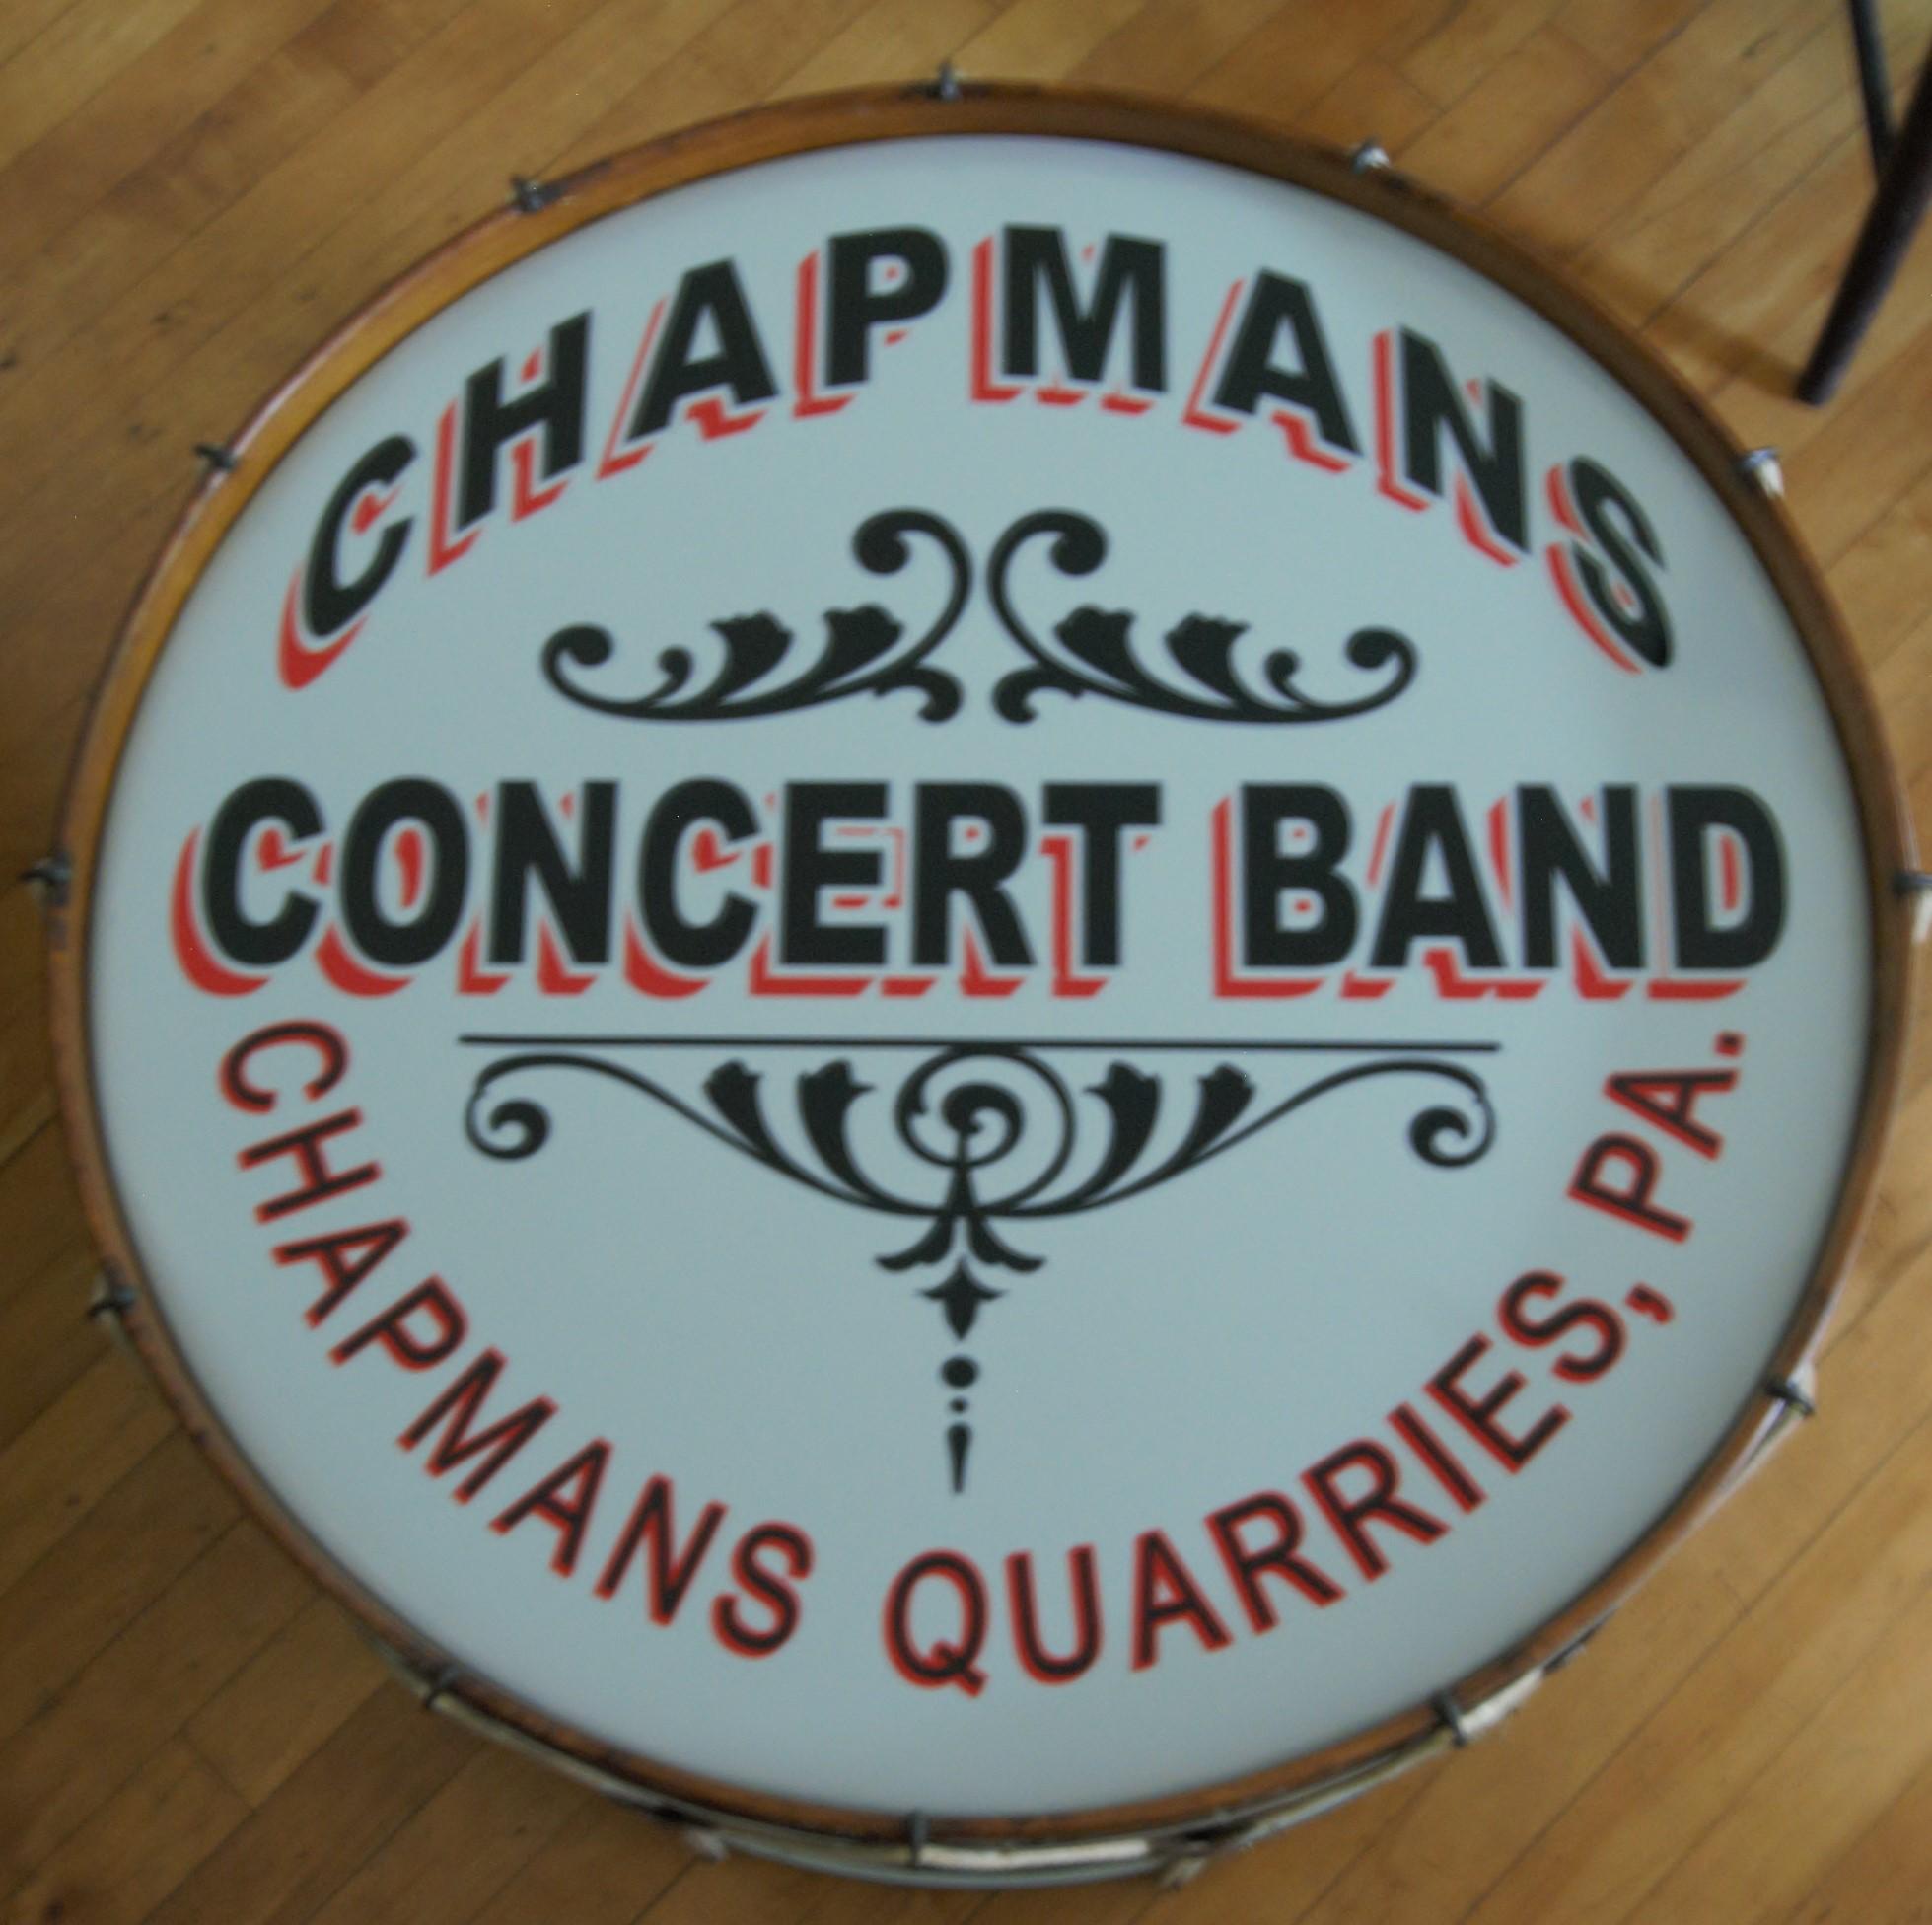 Bass Drum - Chapmans Concert Band